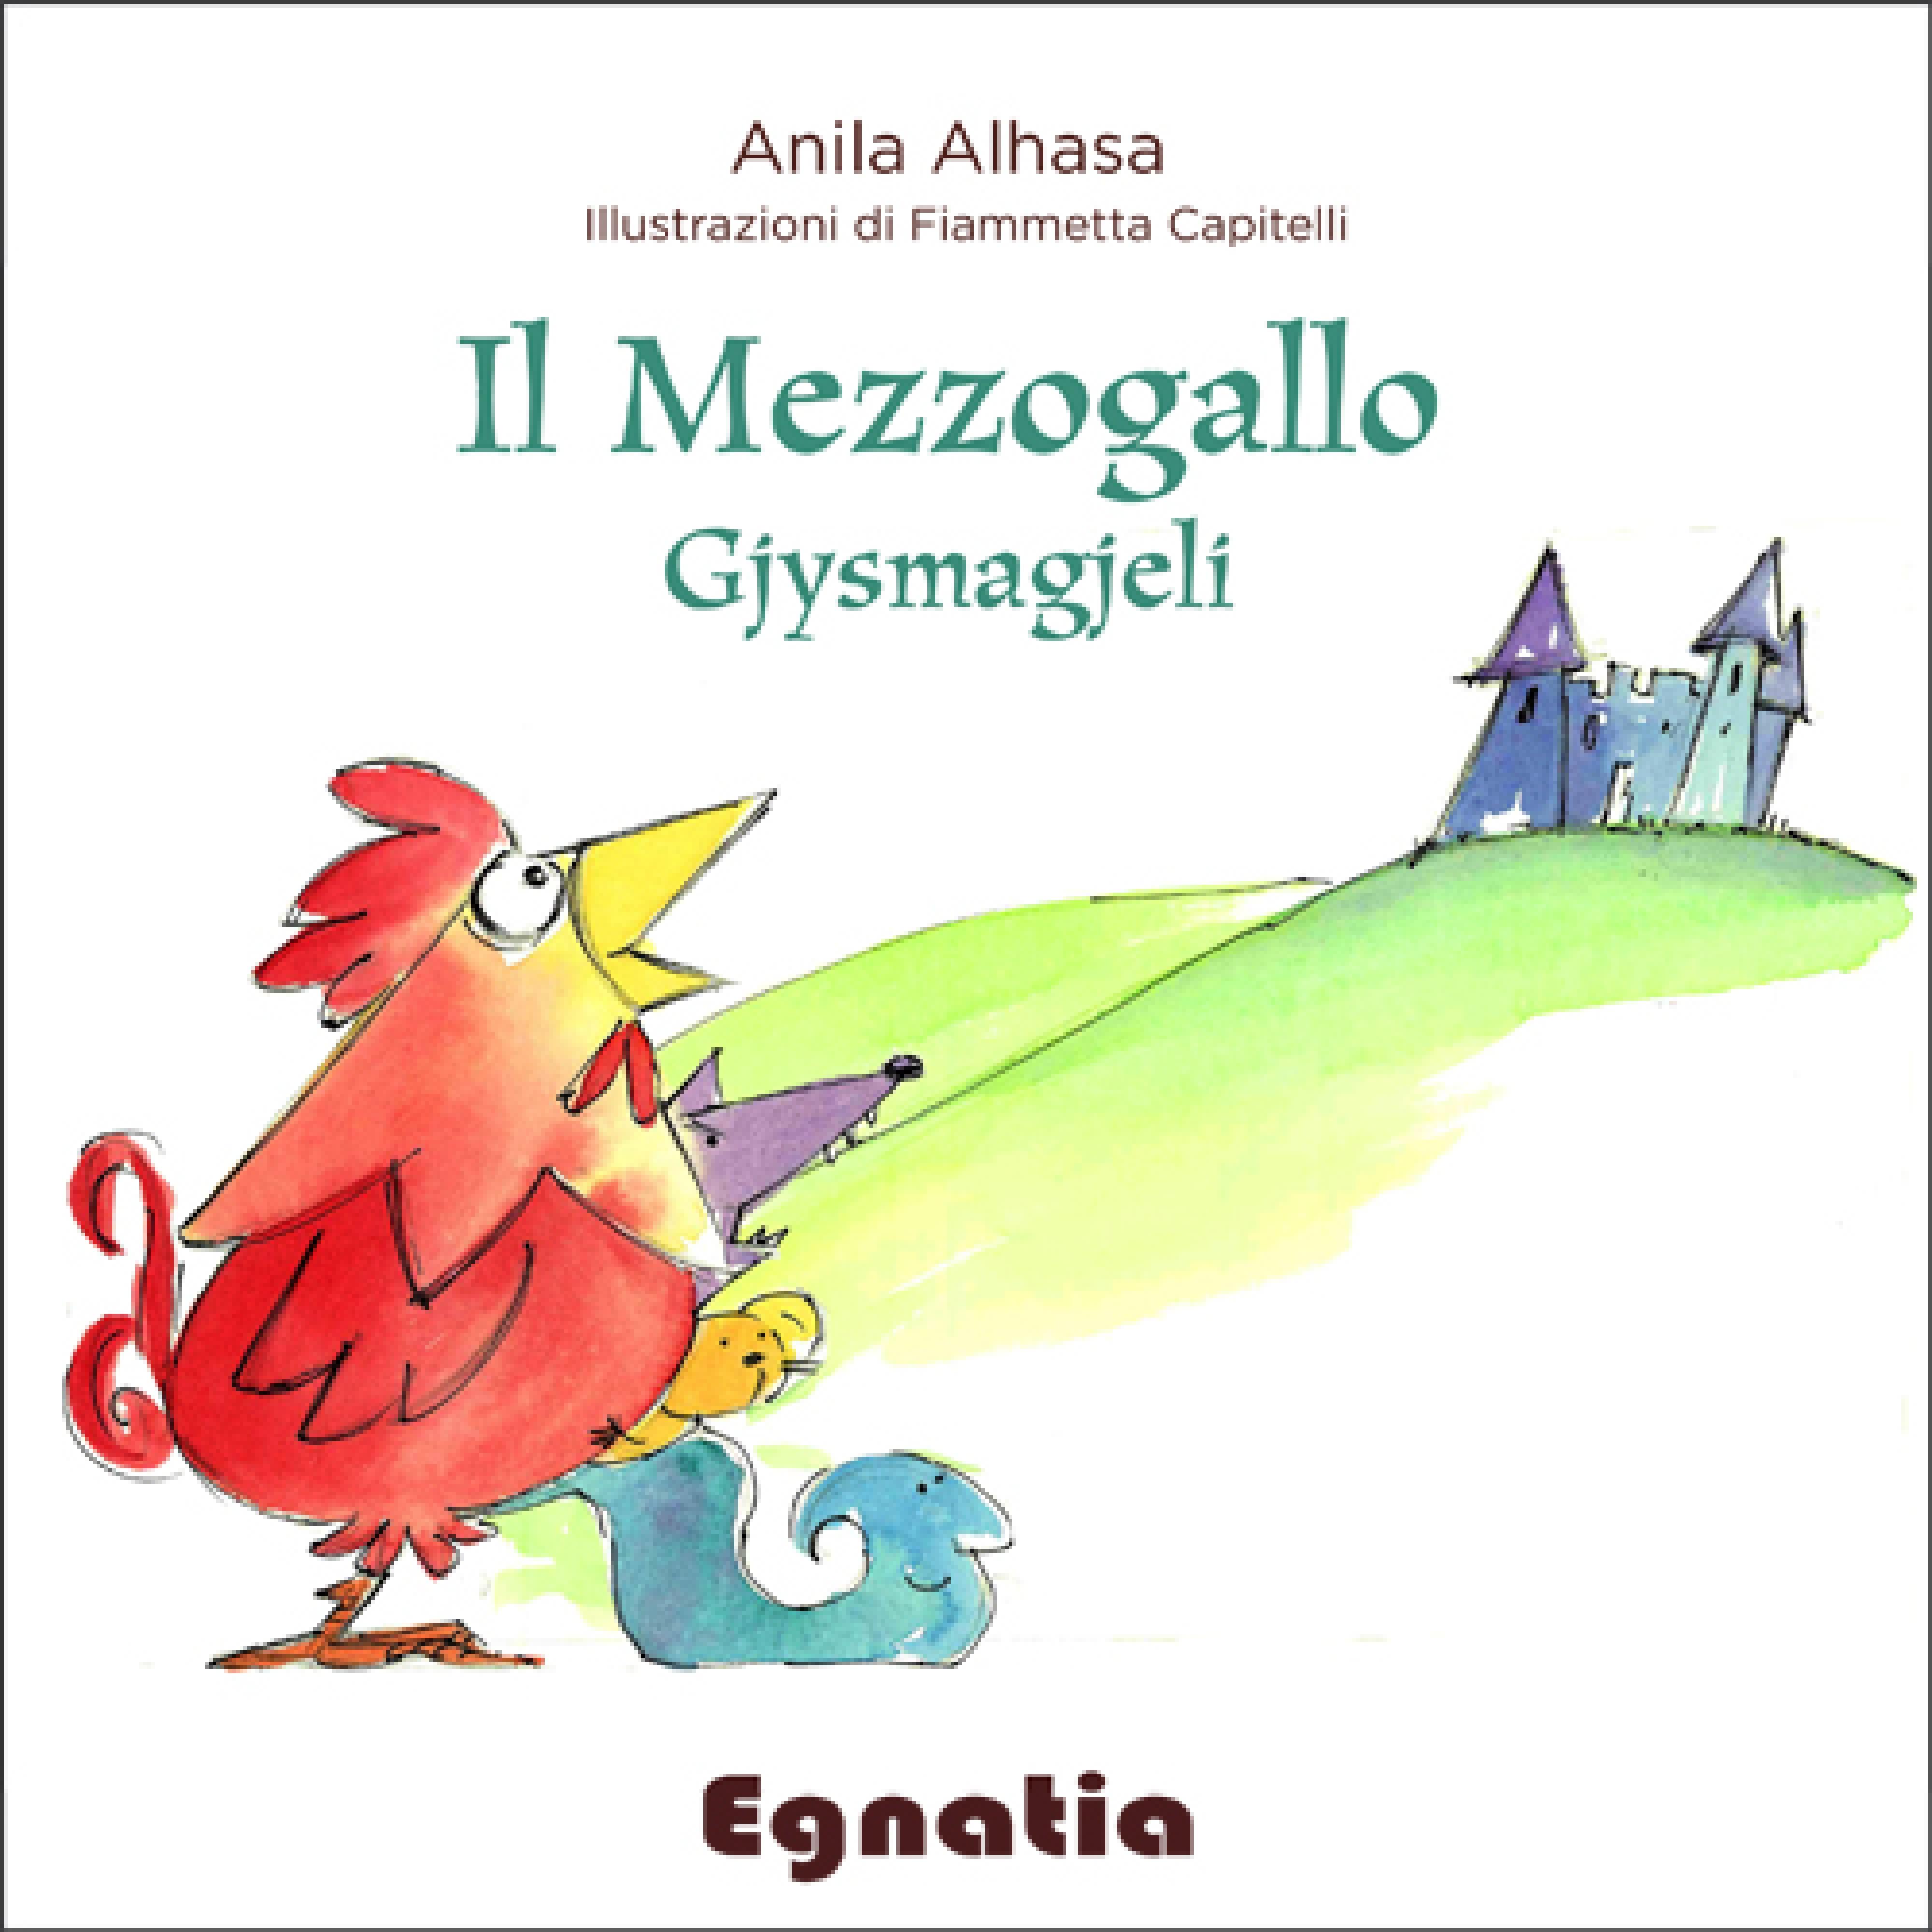 Il mezzogallo - Gjysmagjeli